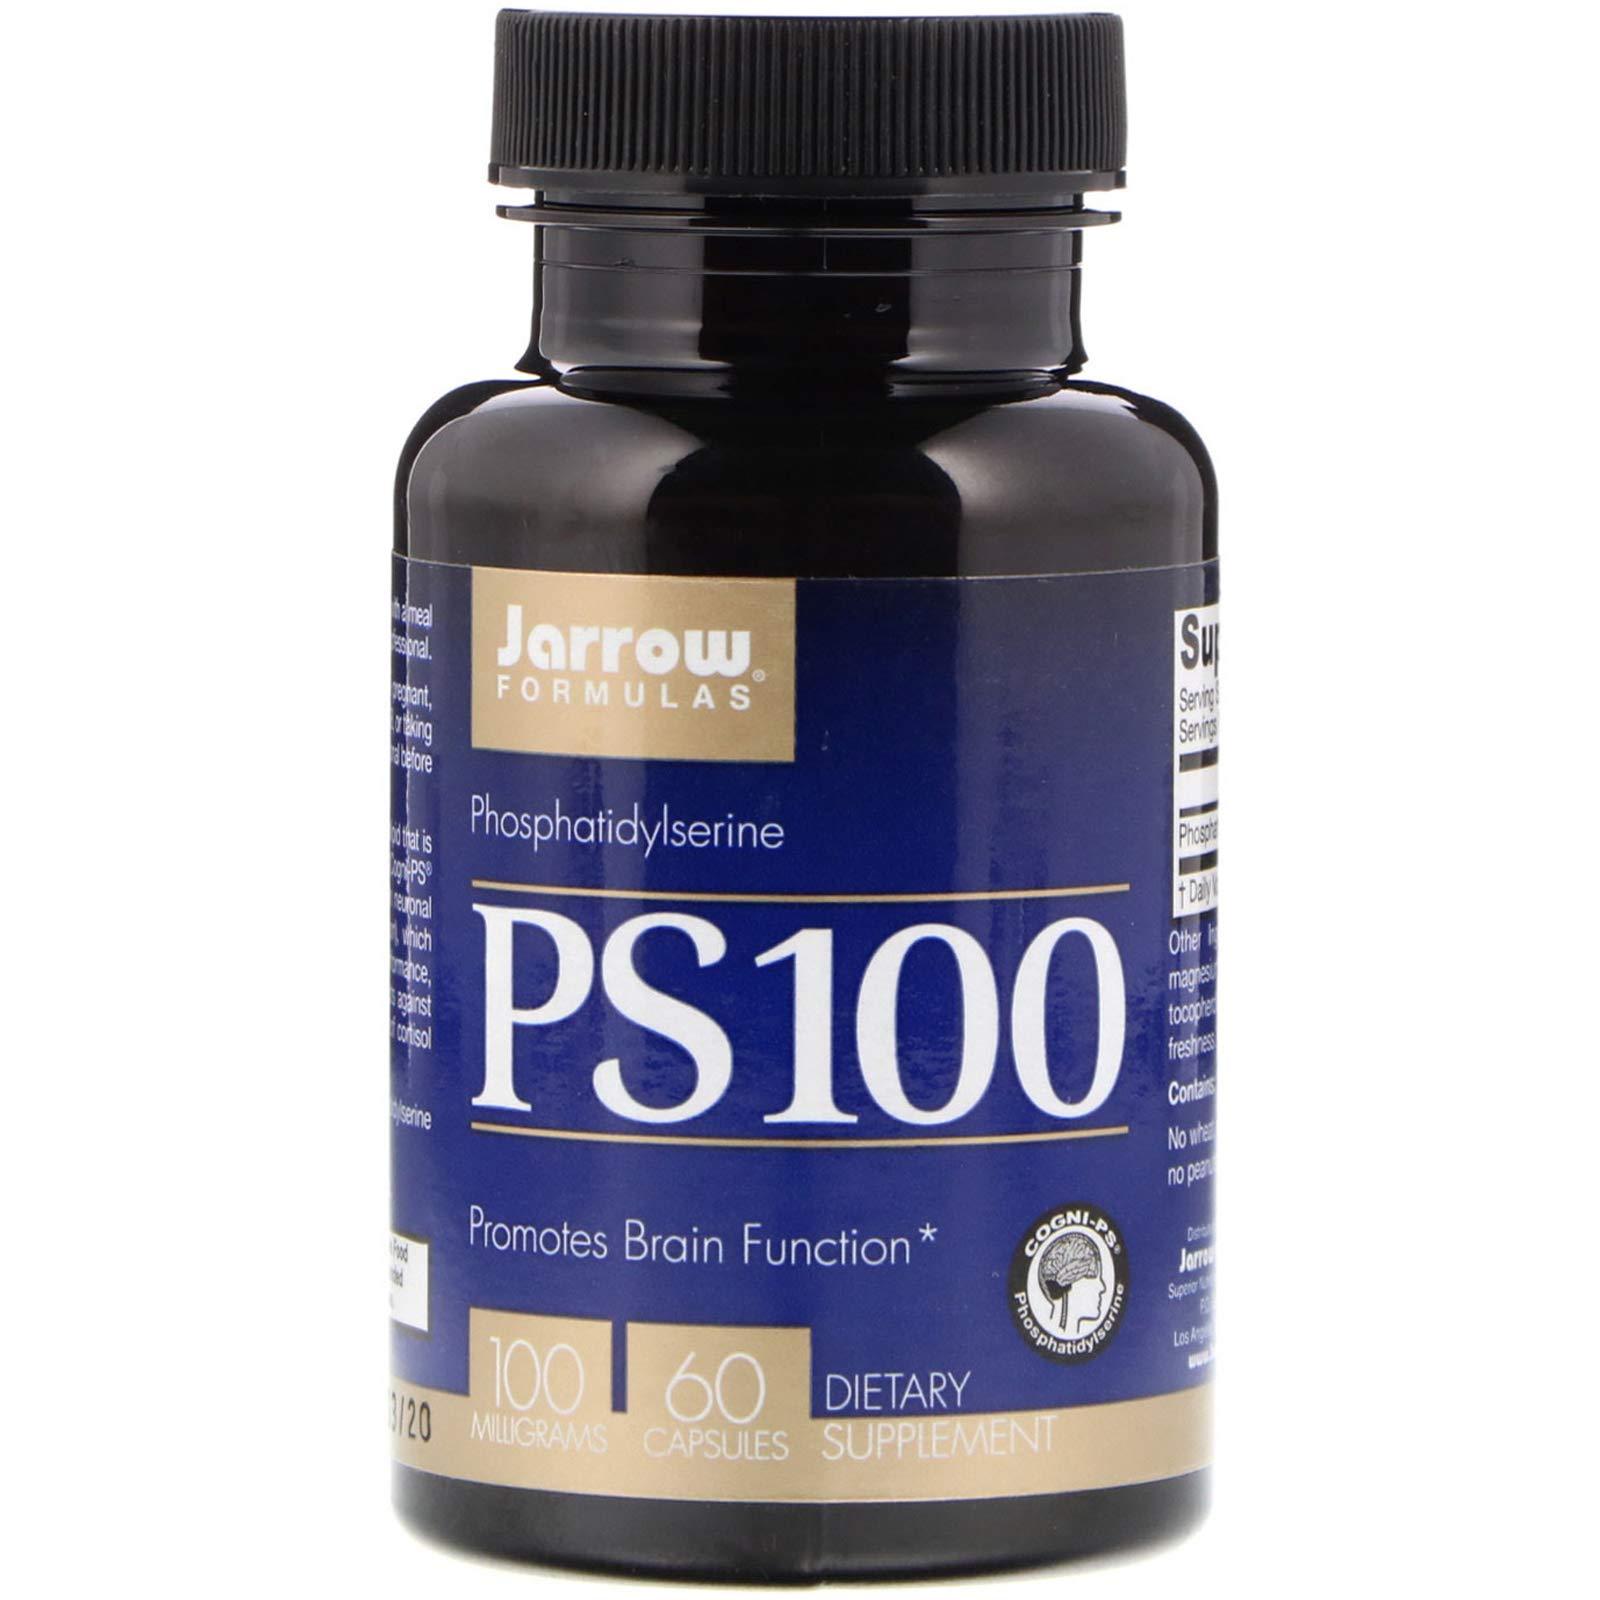 Jarrow Formulas, PS-100, Phosphatidylserine, 100 mg, 60 Capsules